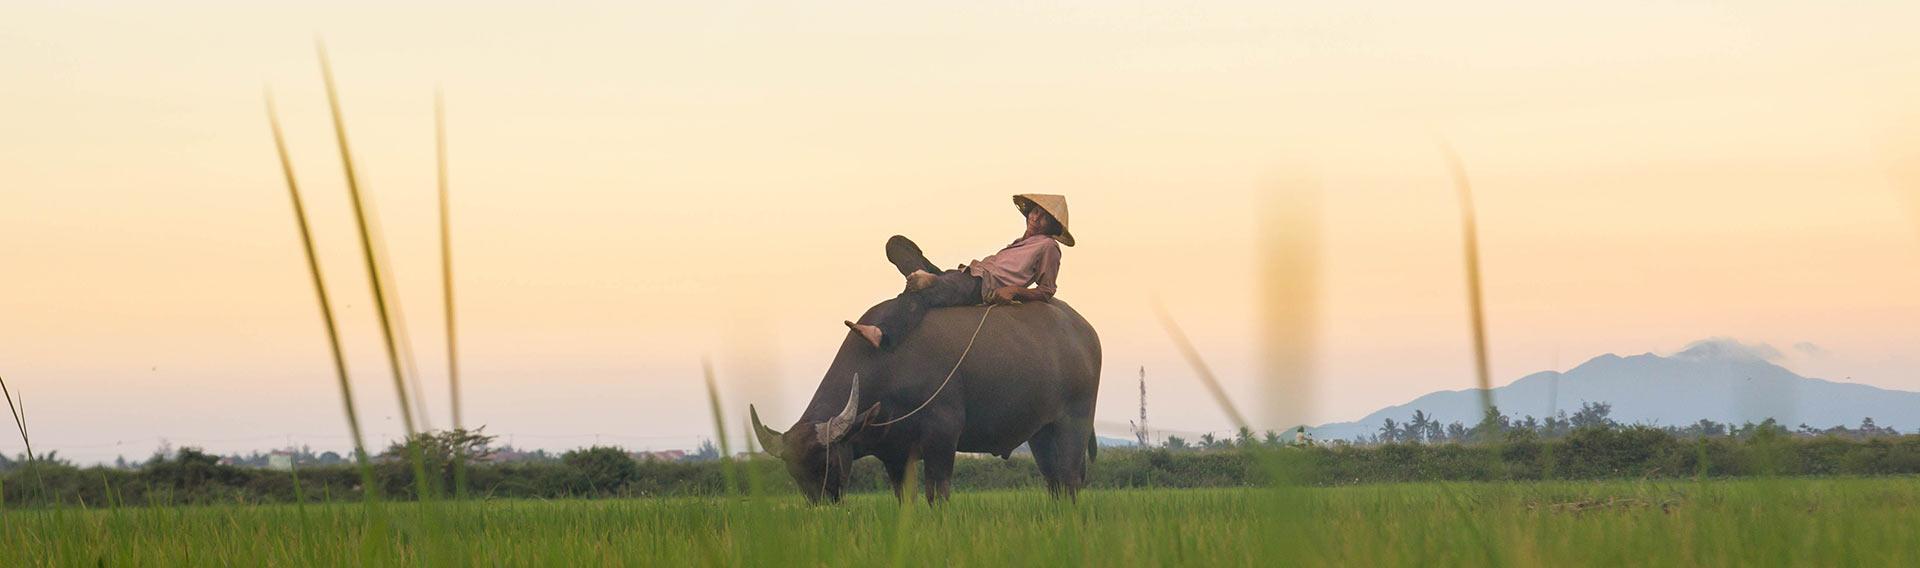 Vietnam, Paysages verts